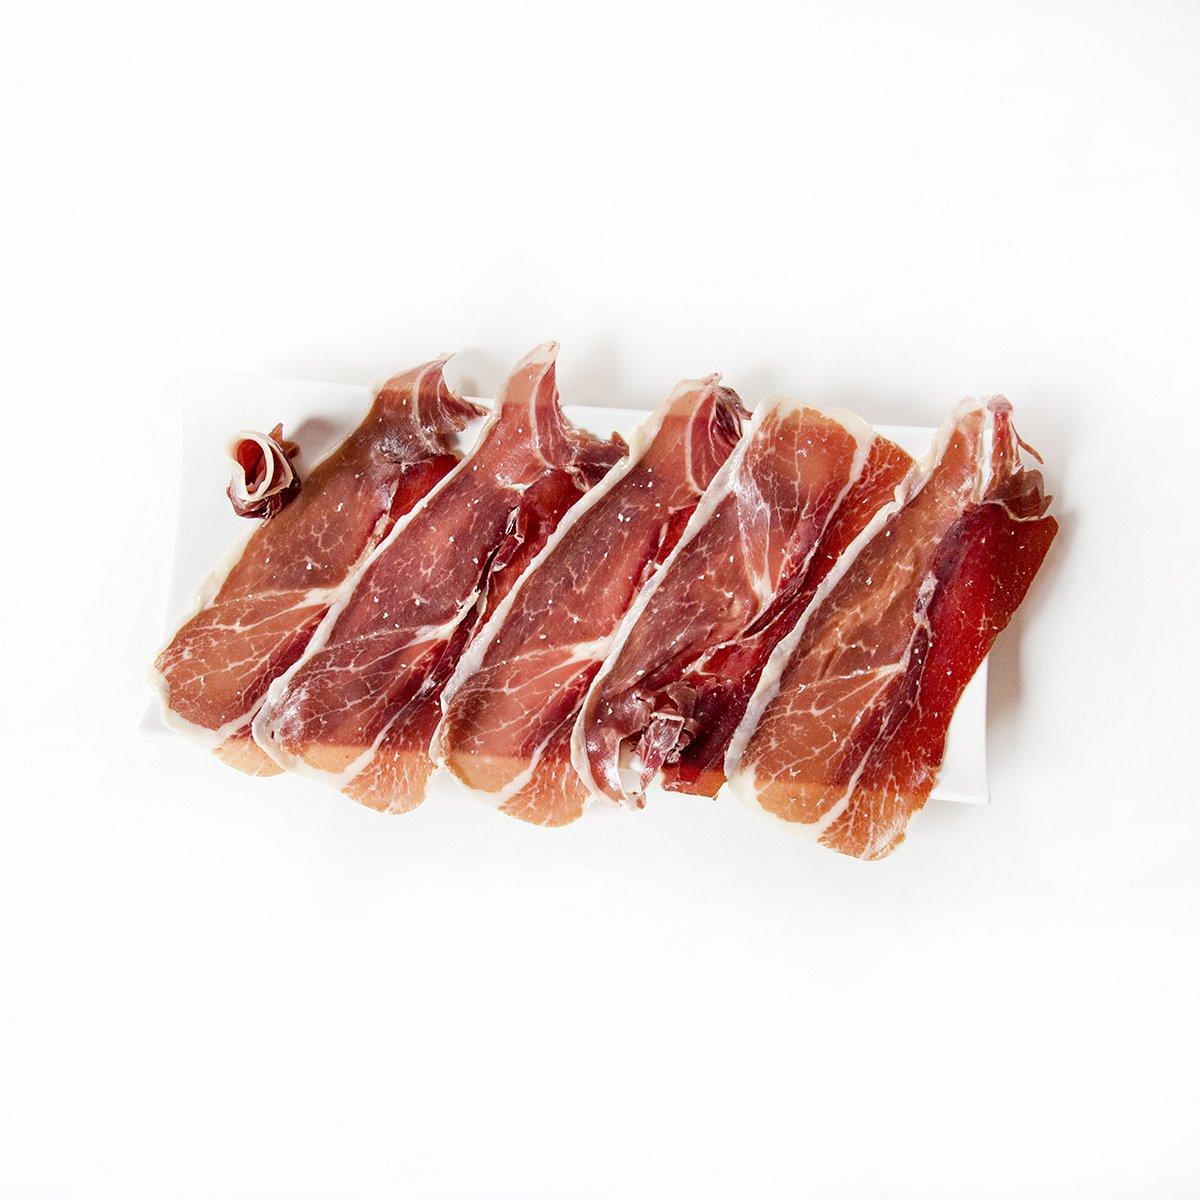 Fodder-Fed Iberian Ham